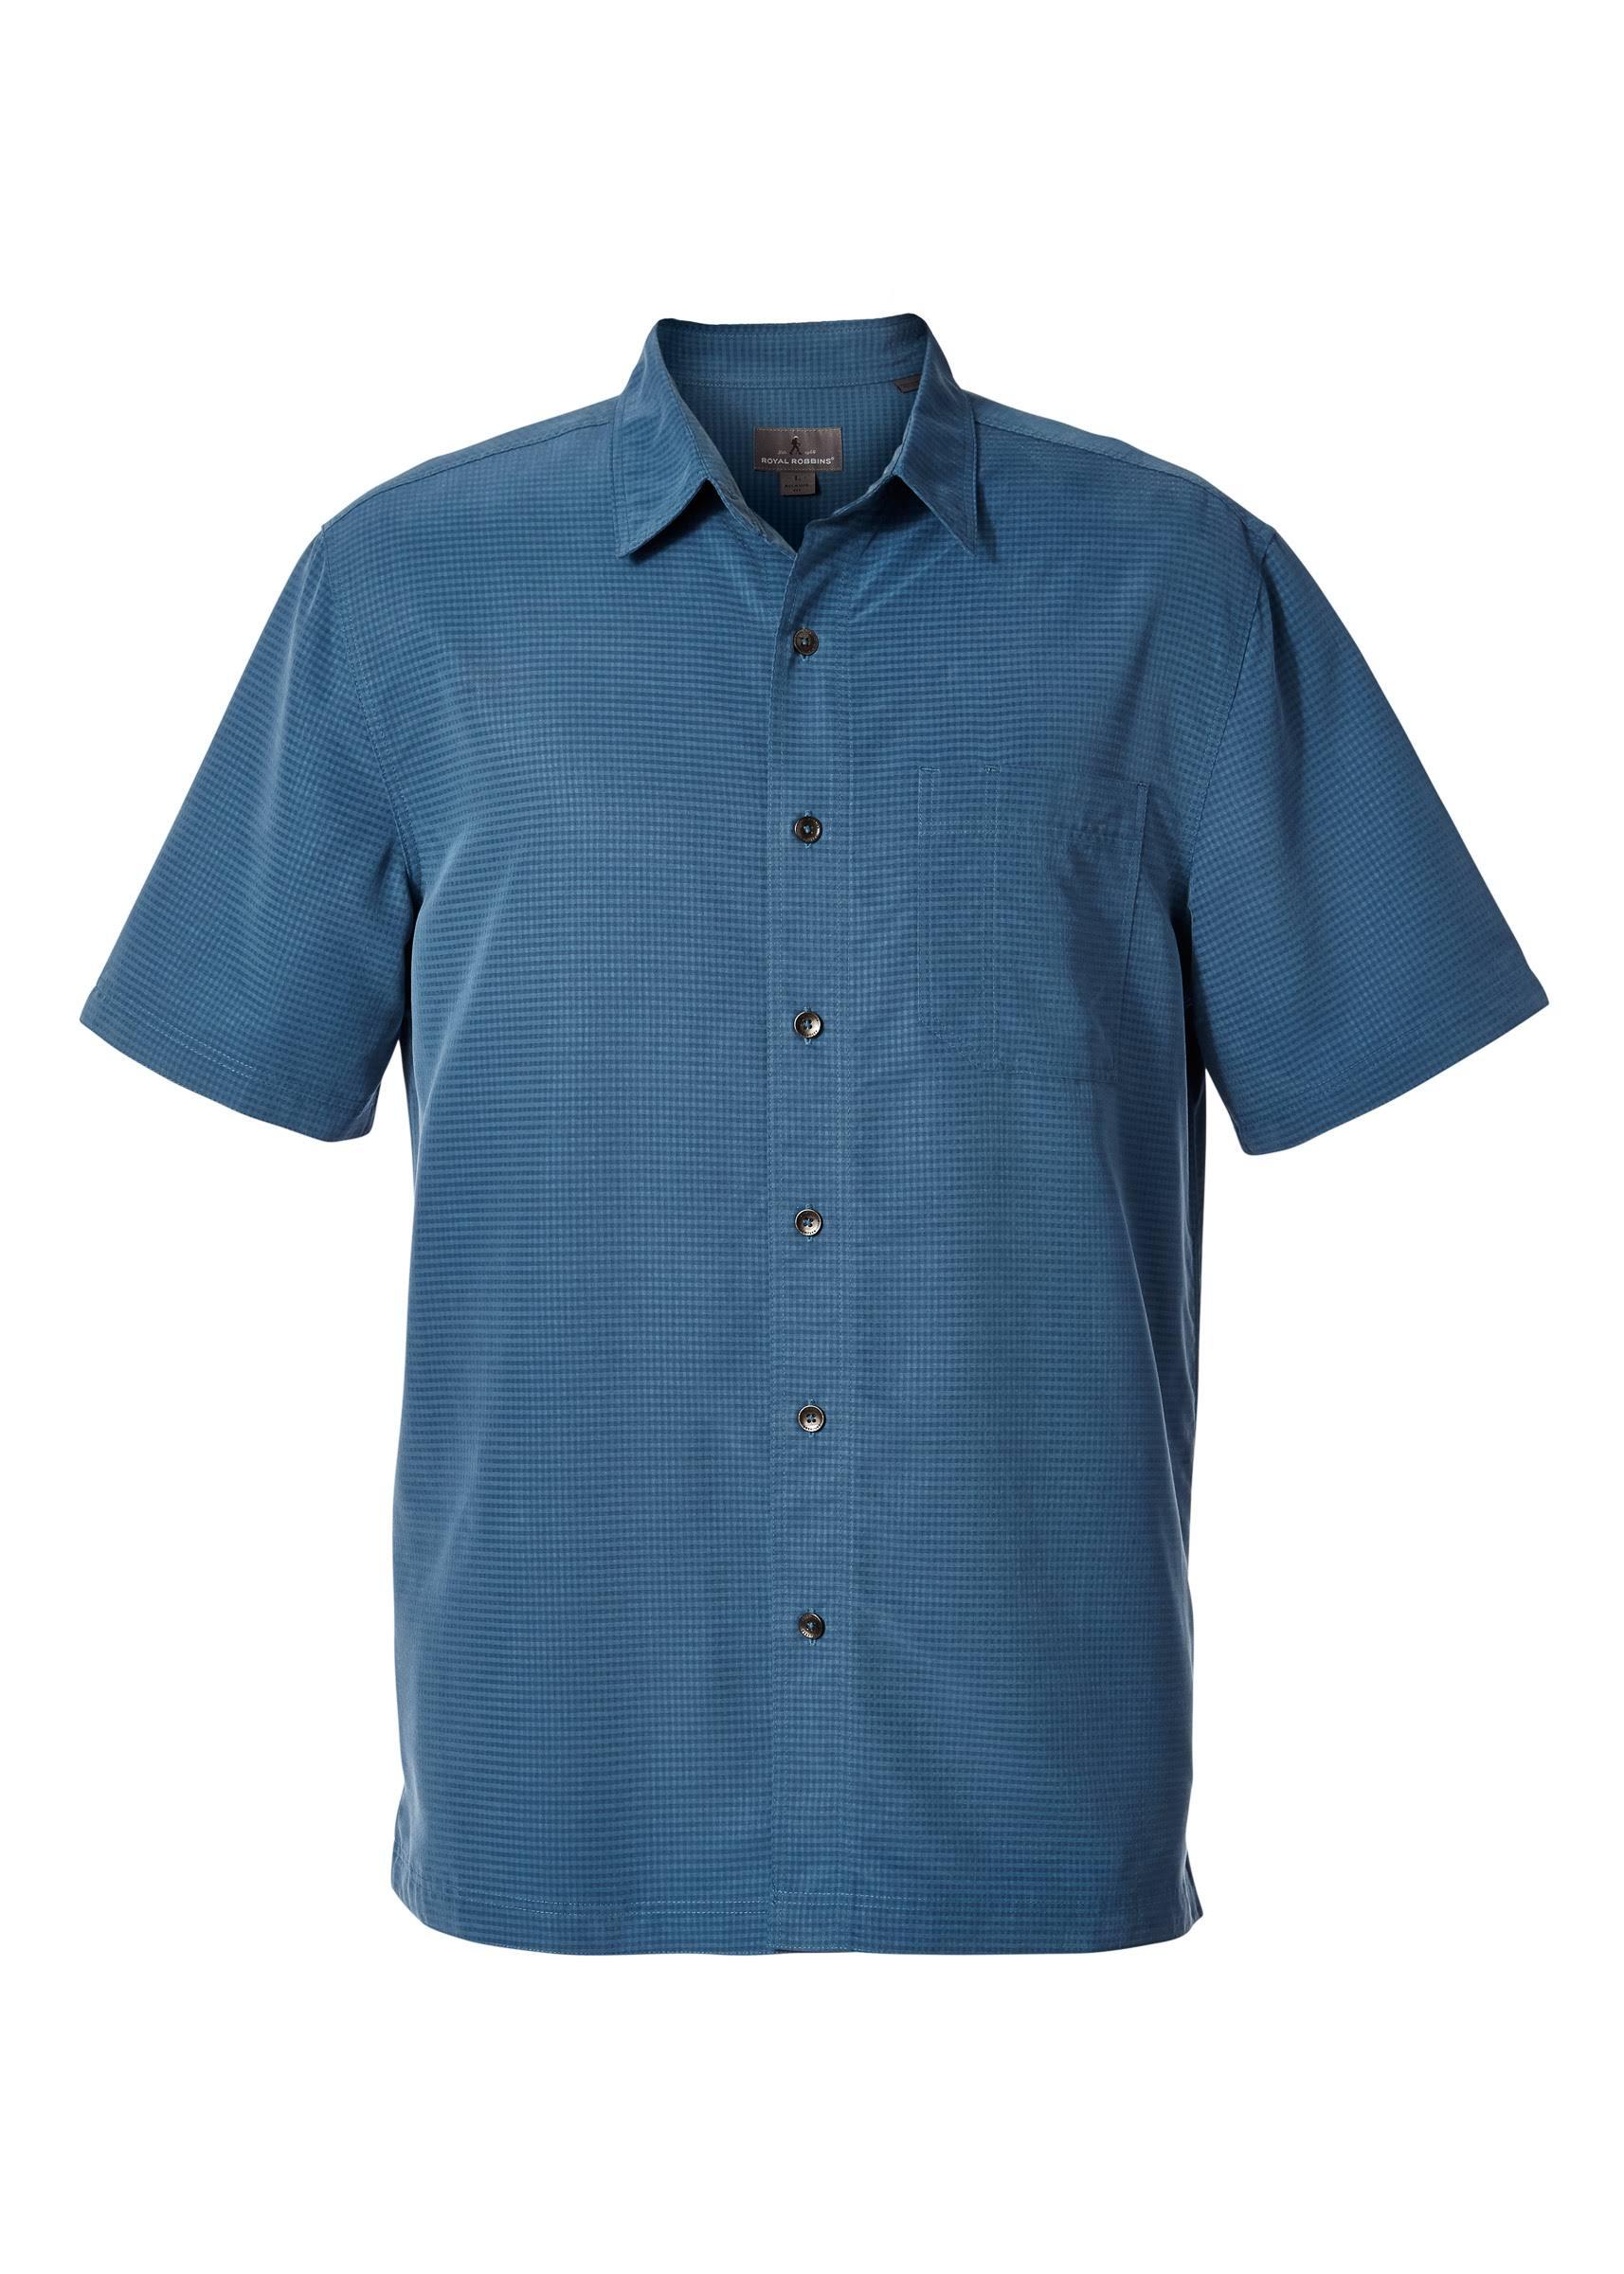 Royal Manga Para Stone Hombre De Pucker Camisa 71200 Dry Stone t Robbins Tall blue S s Blue Desert Corta wgtxqH